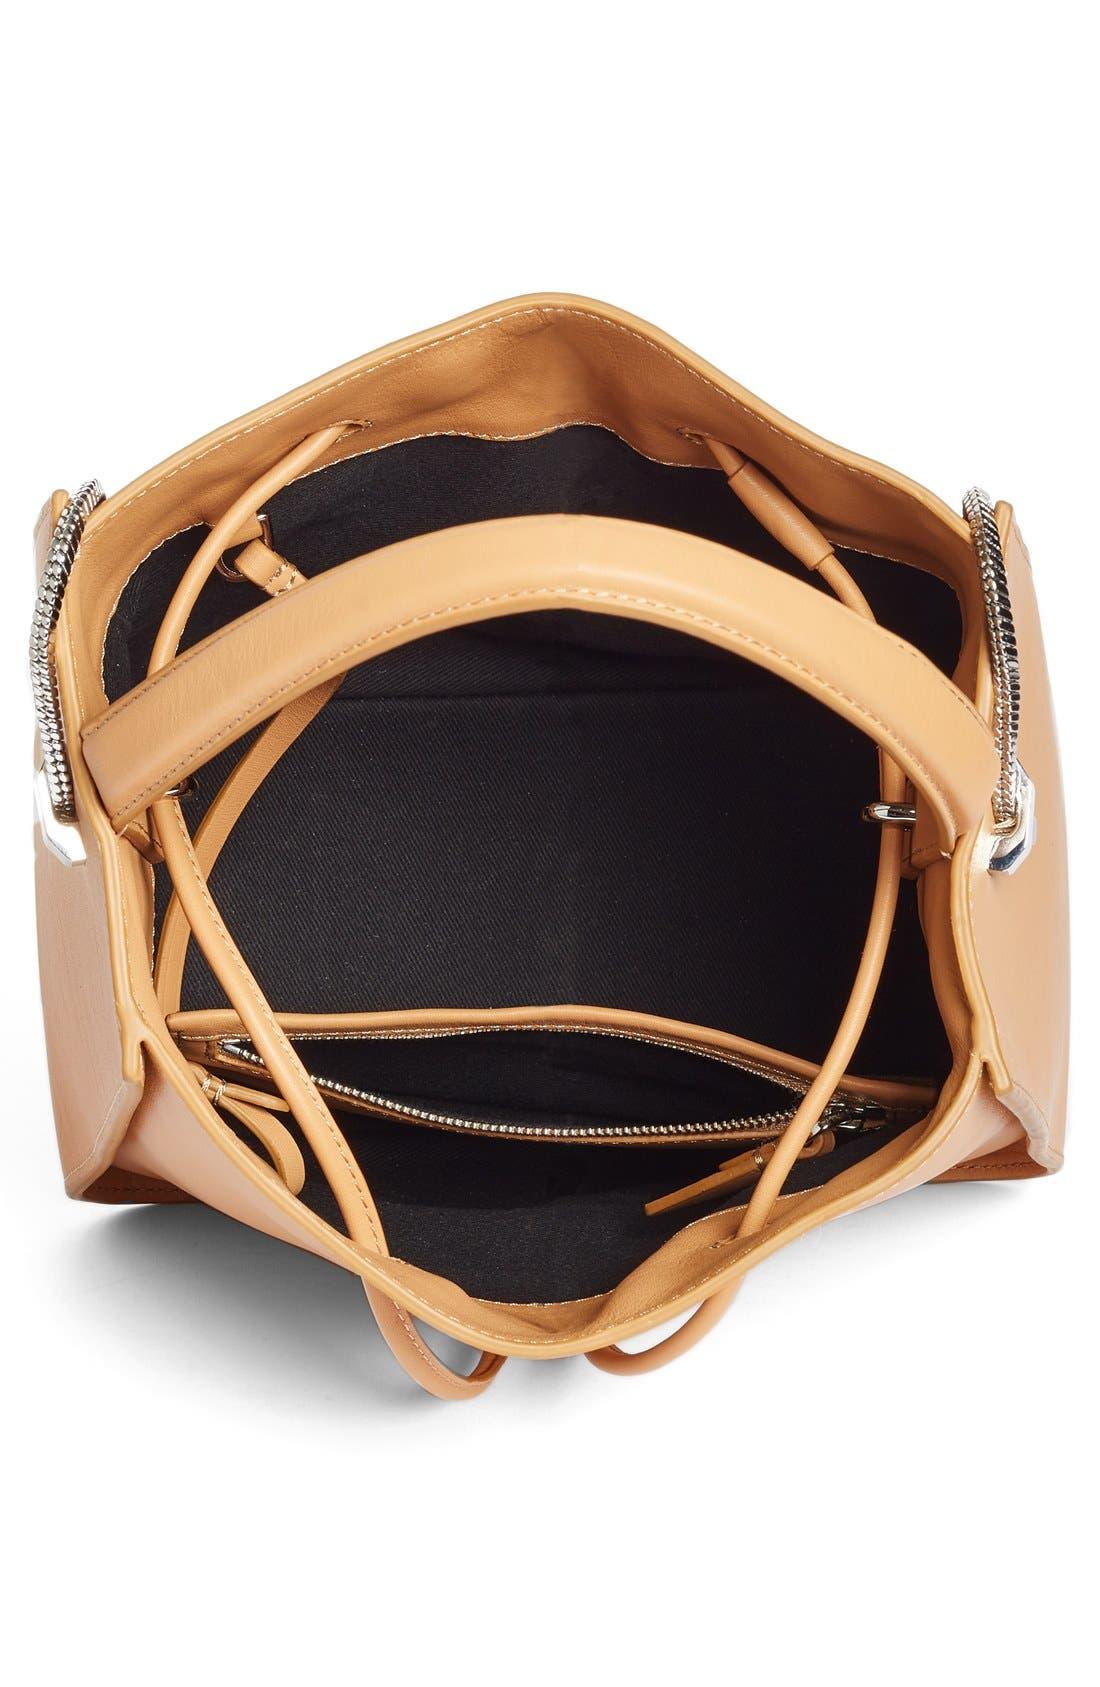 Mini Soleil Leather Bucket Bag,                             Alternate thumbnail 3, color,                             249